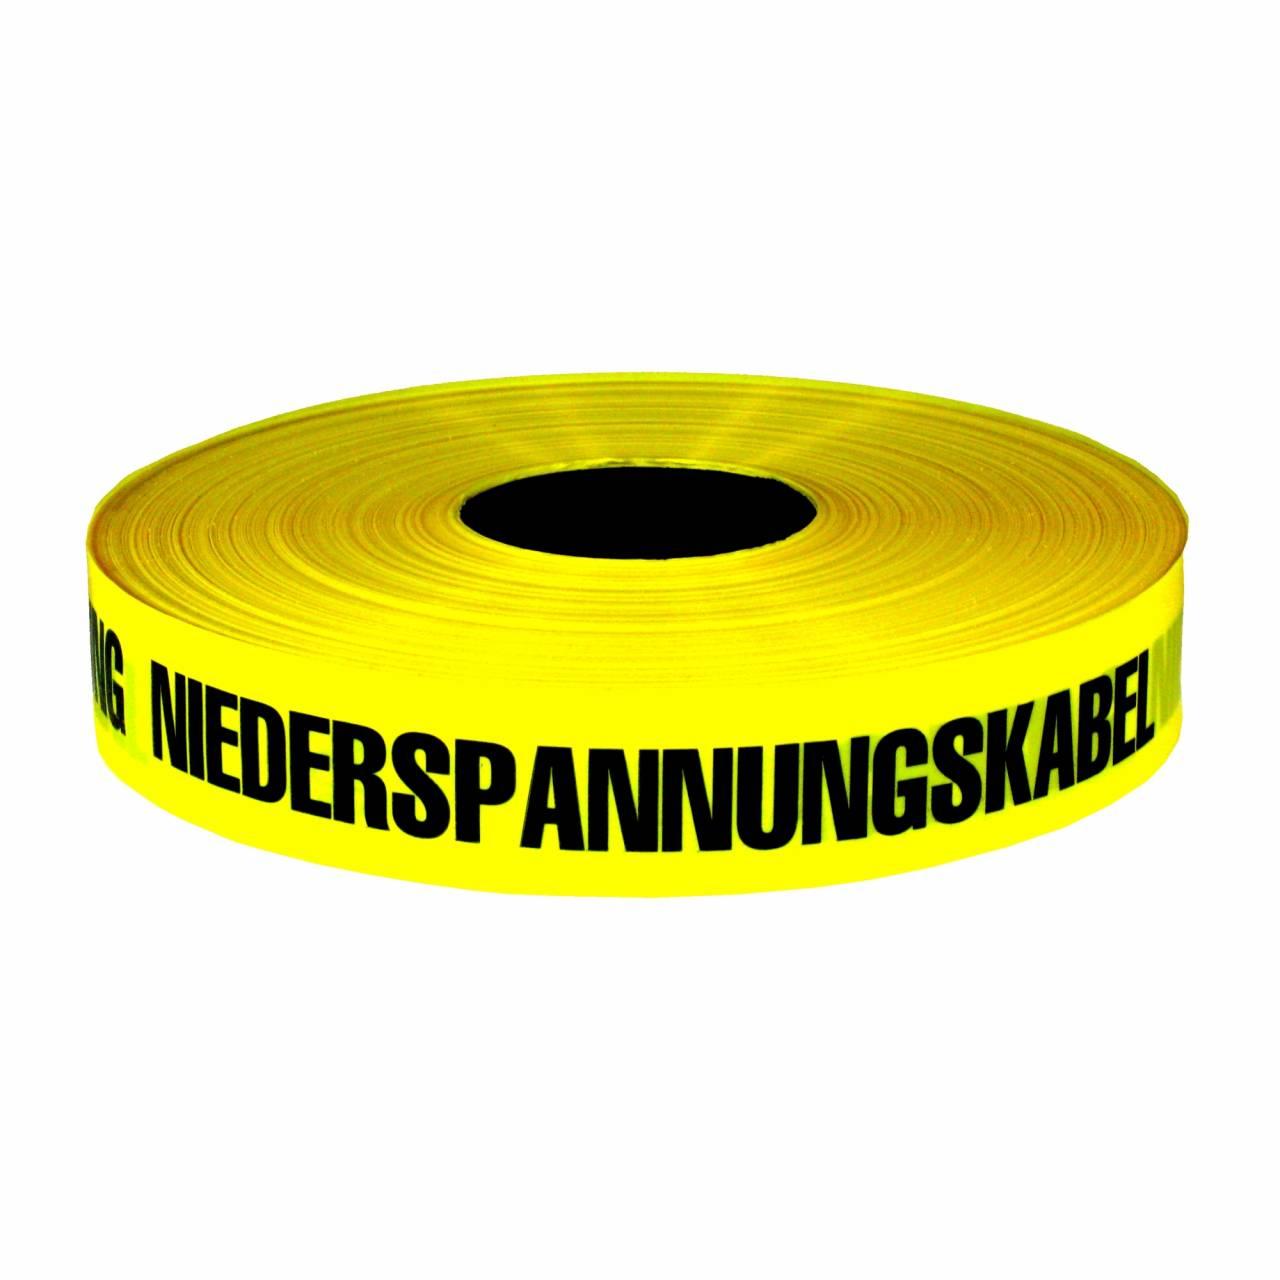 Trassenwarnband 'Achtung Niederspannung' / Rolle 40 mm x 250 m